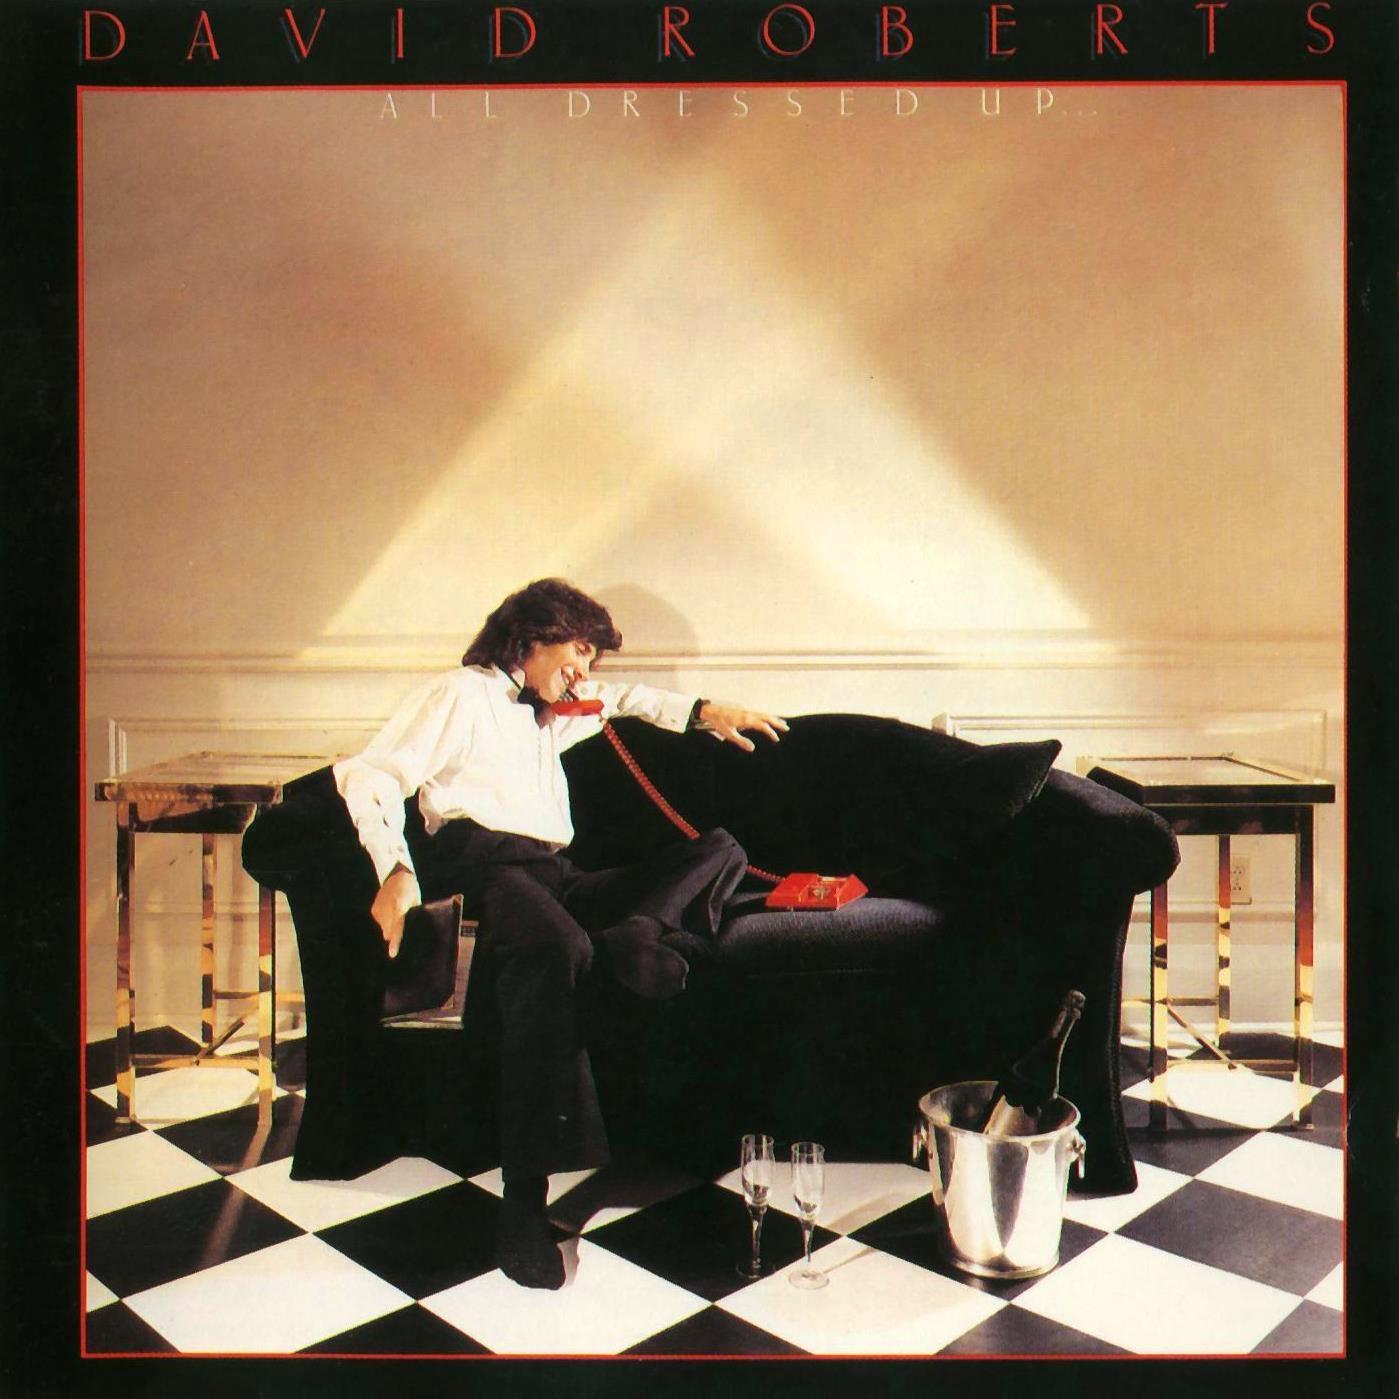 David Roberts All dressep up 1982 aor melodic rock